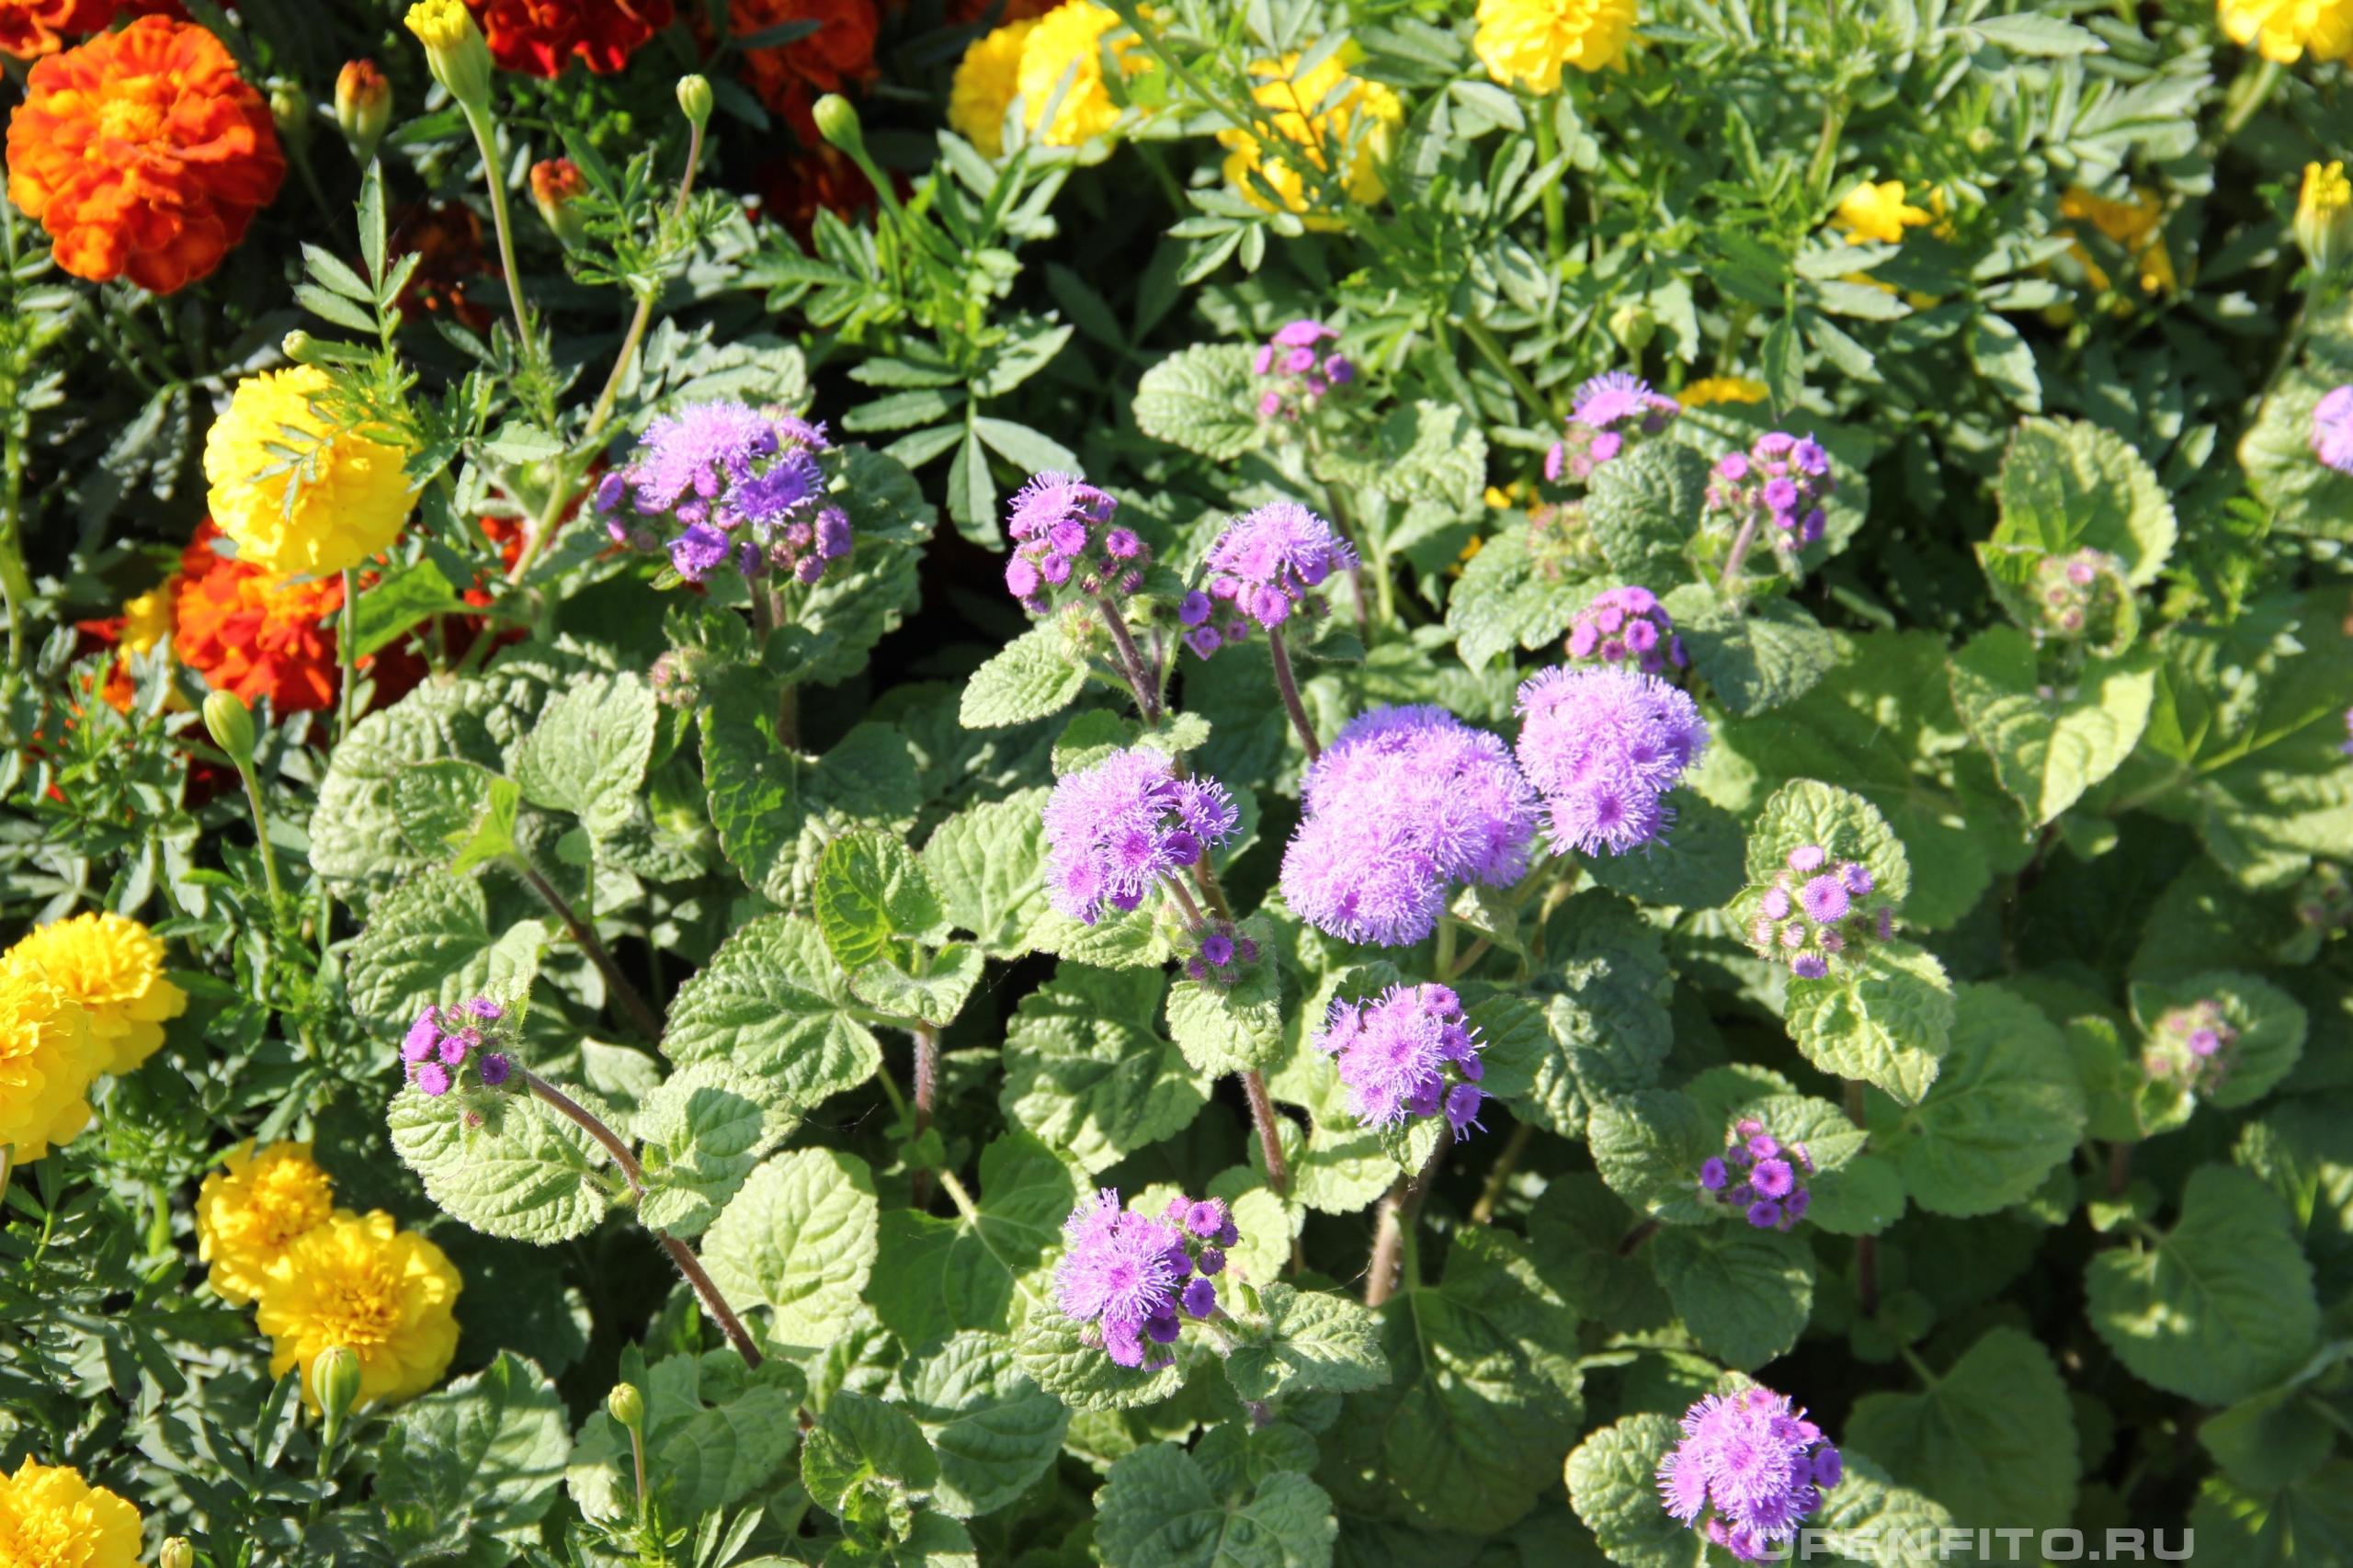 Агератум Хьюстона садовый цветок